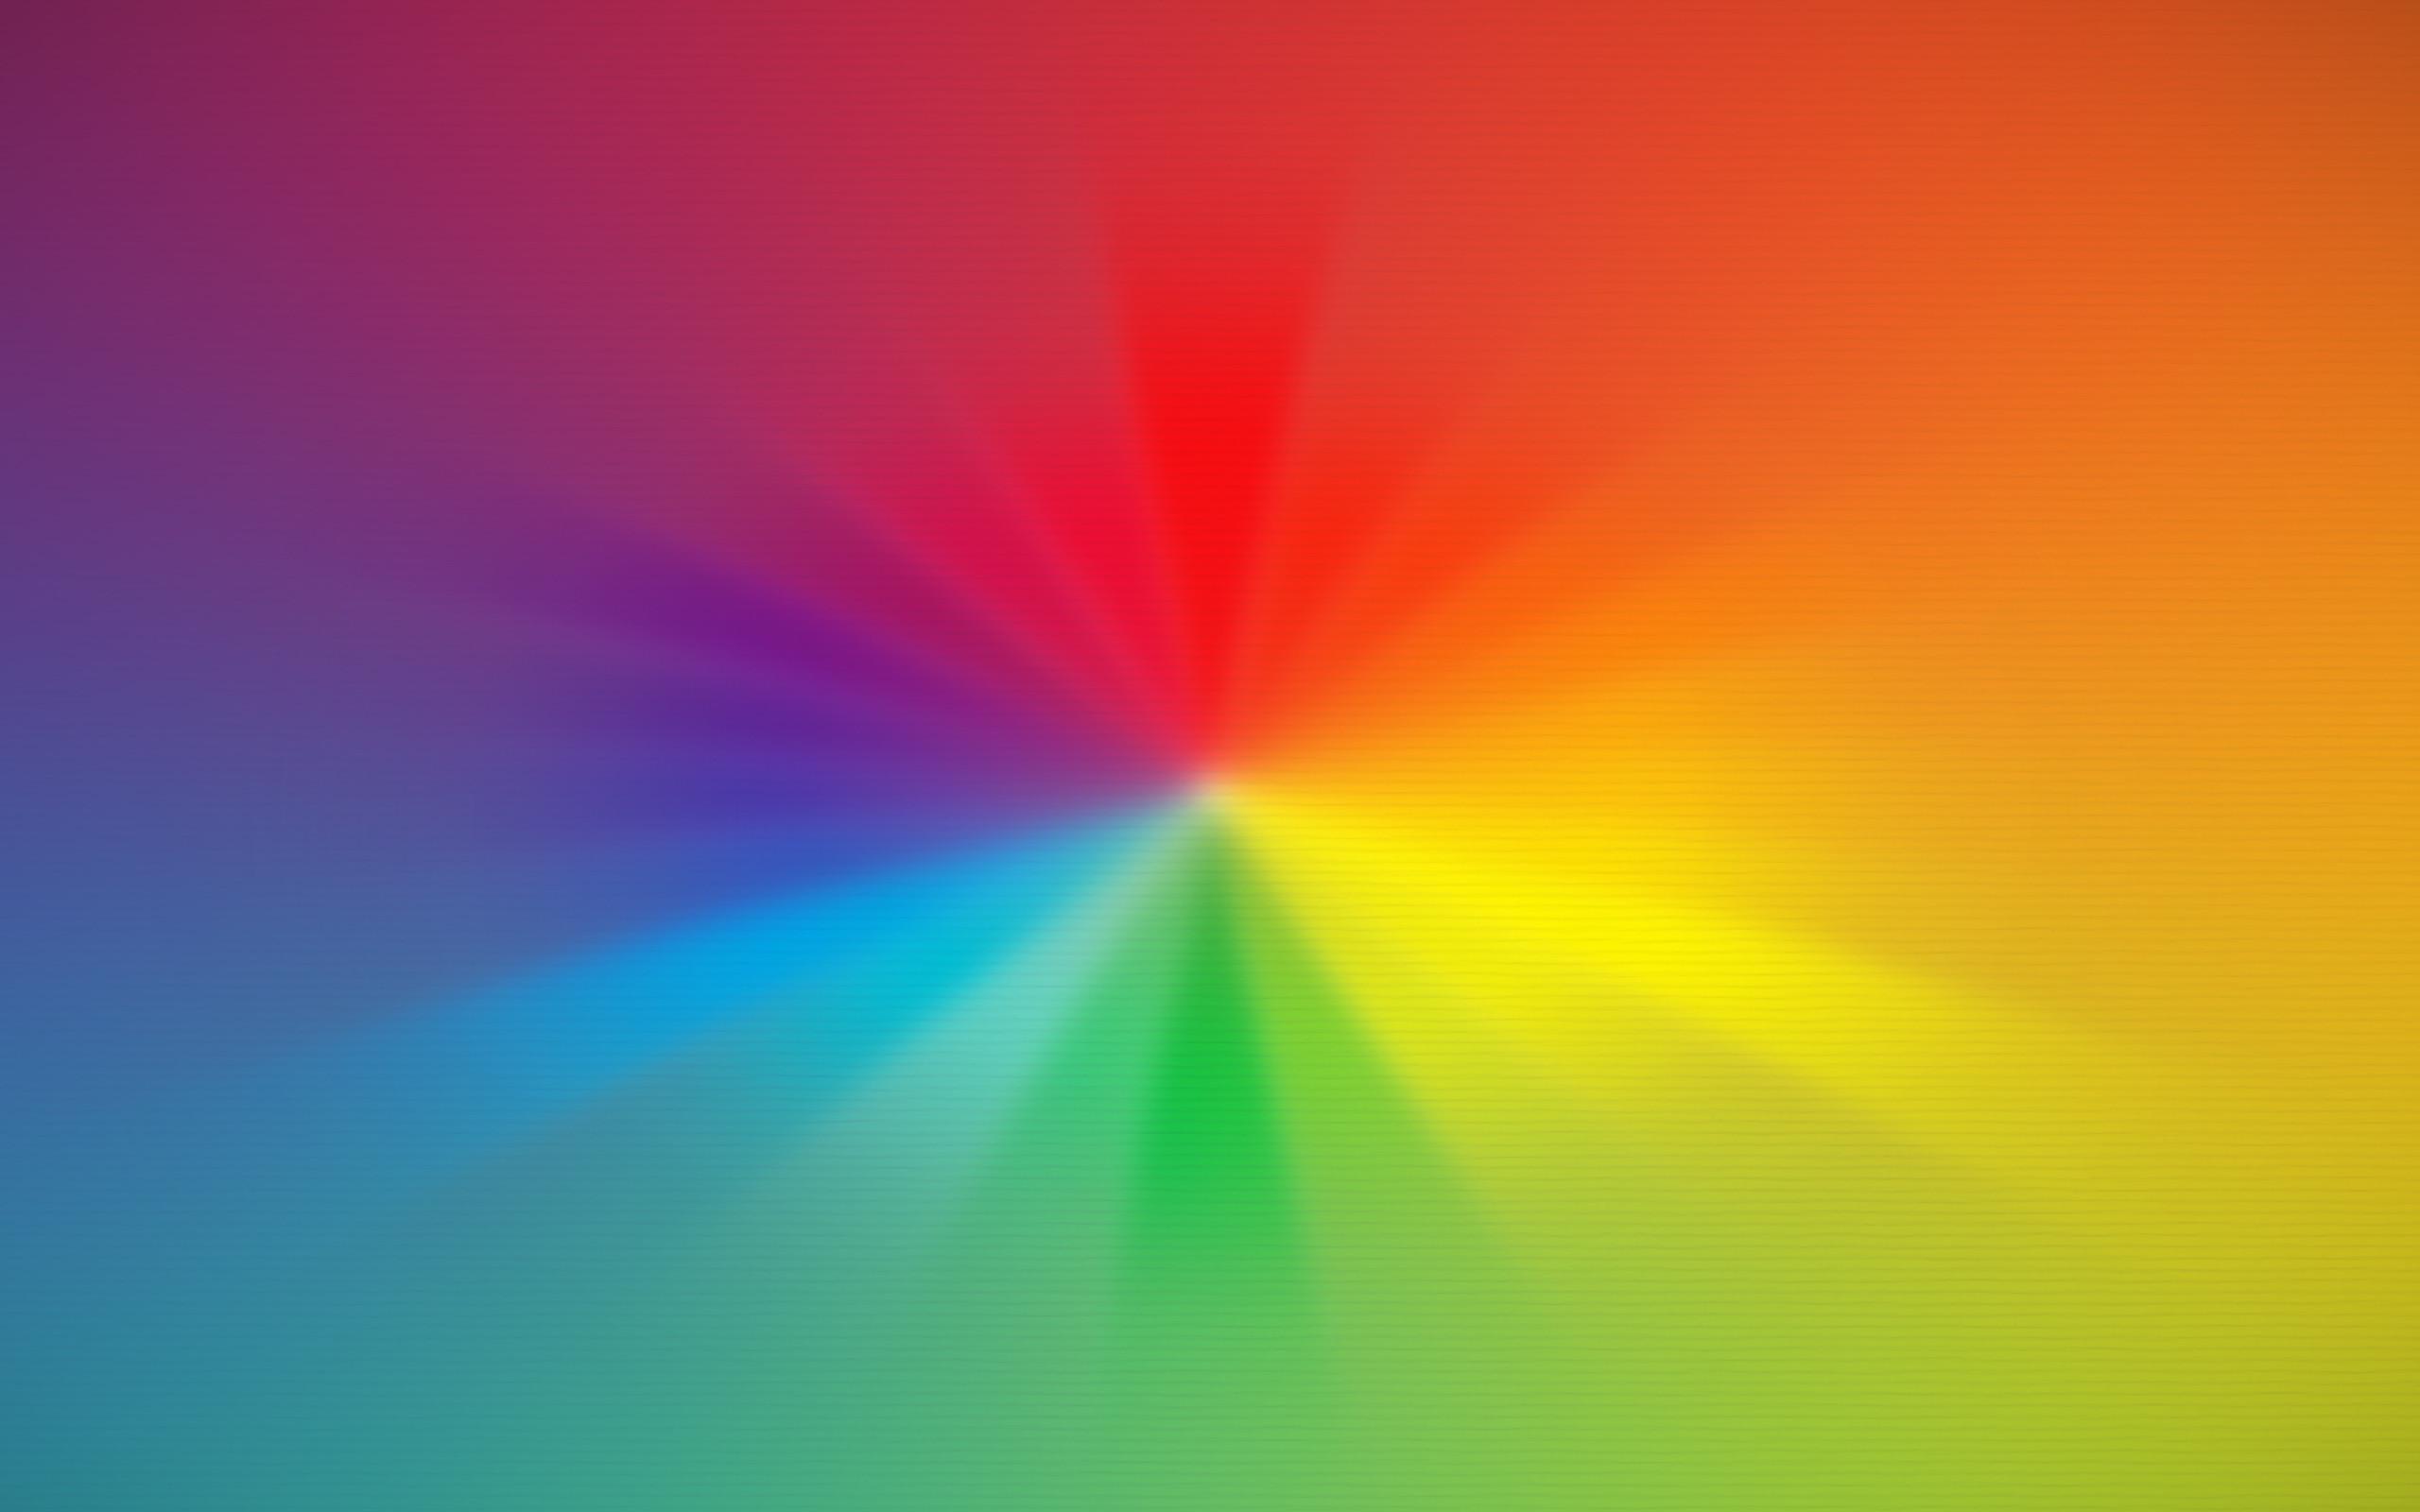 30 Impressive Colour Spectrum and Rainbow Wallpapers